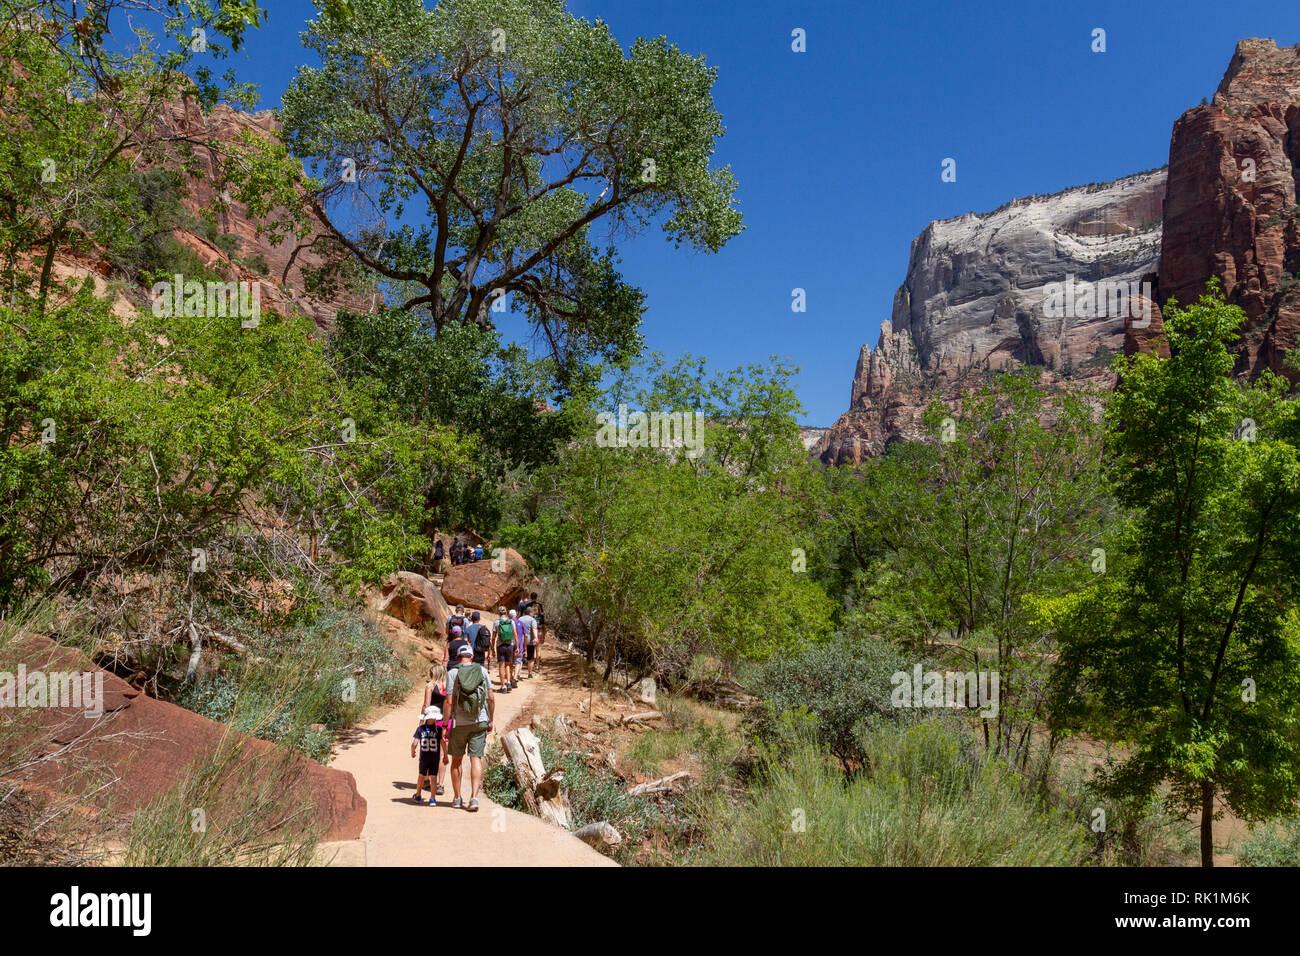 Wanderer auf Emerald Pools Trail neben dem Virgin River in der Nähe des Zion Lodge, Zion National Park, Utah, United States. Stockbild